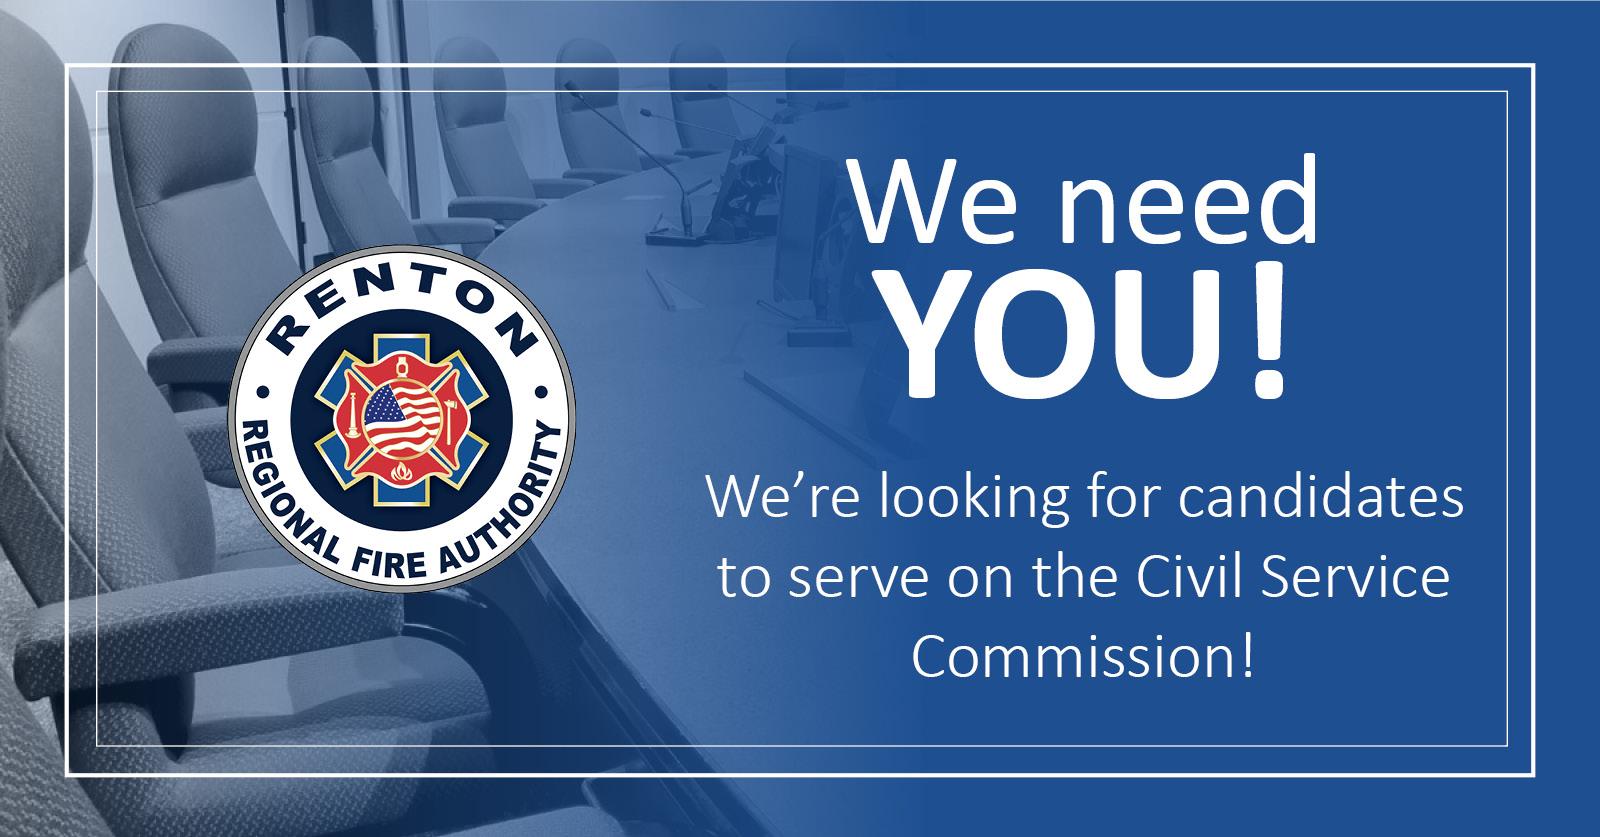 Renton RFA Seeks Candidate for Civil Service Commission